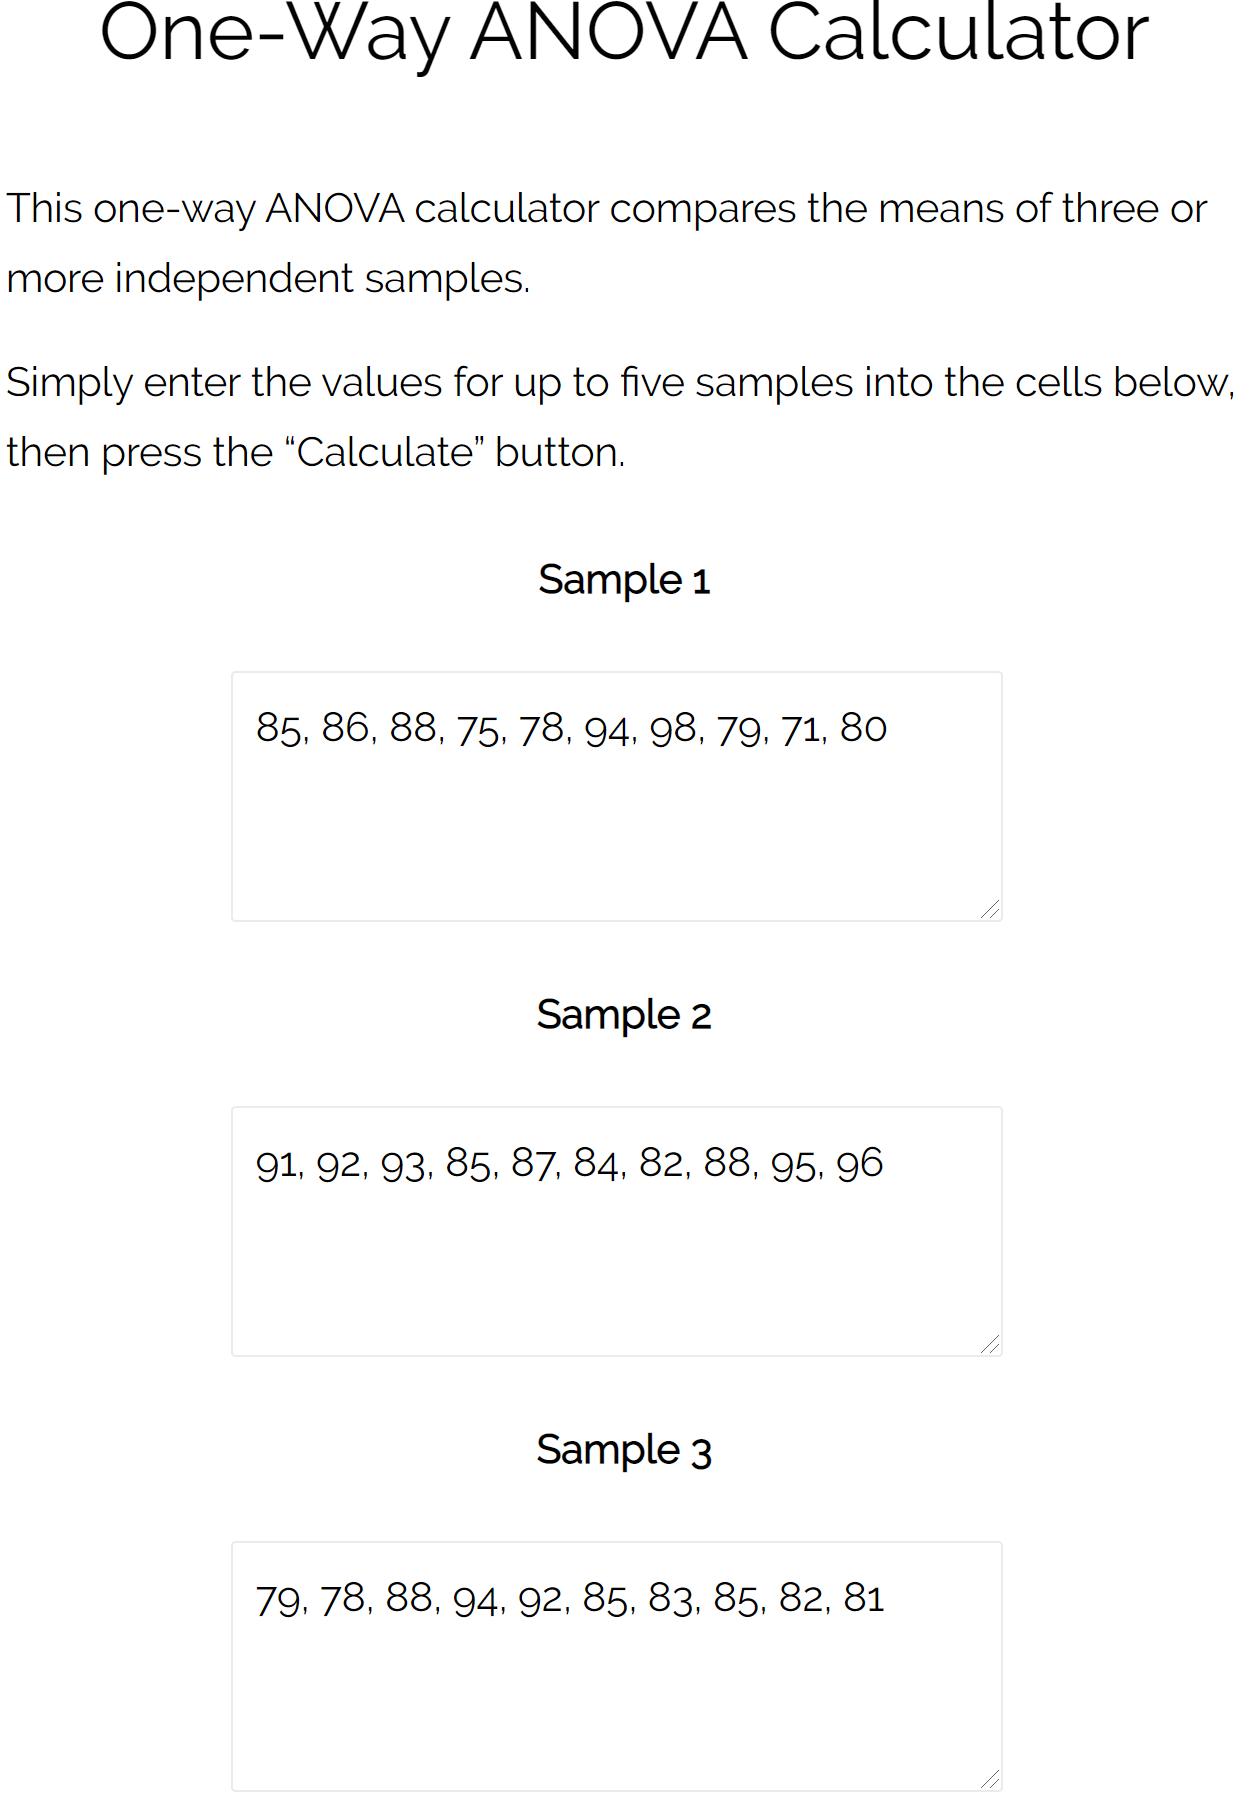 One-way ANOVA calculation example